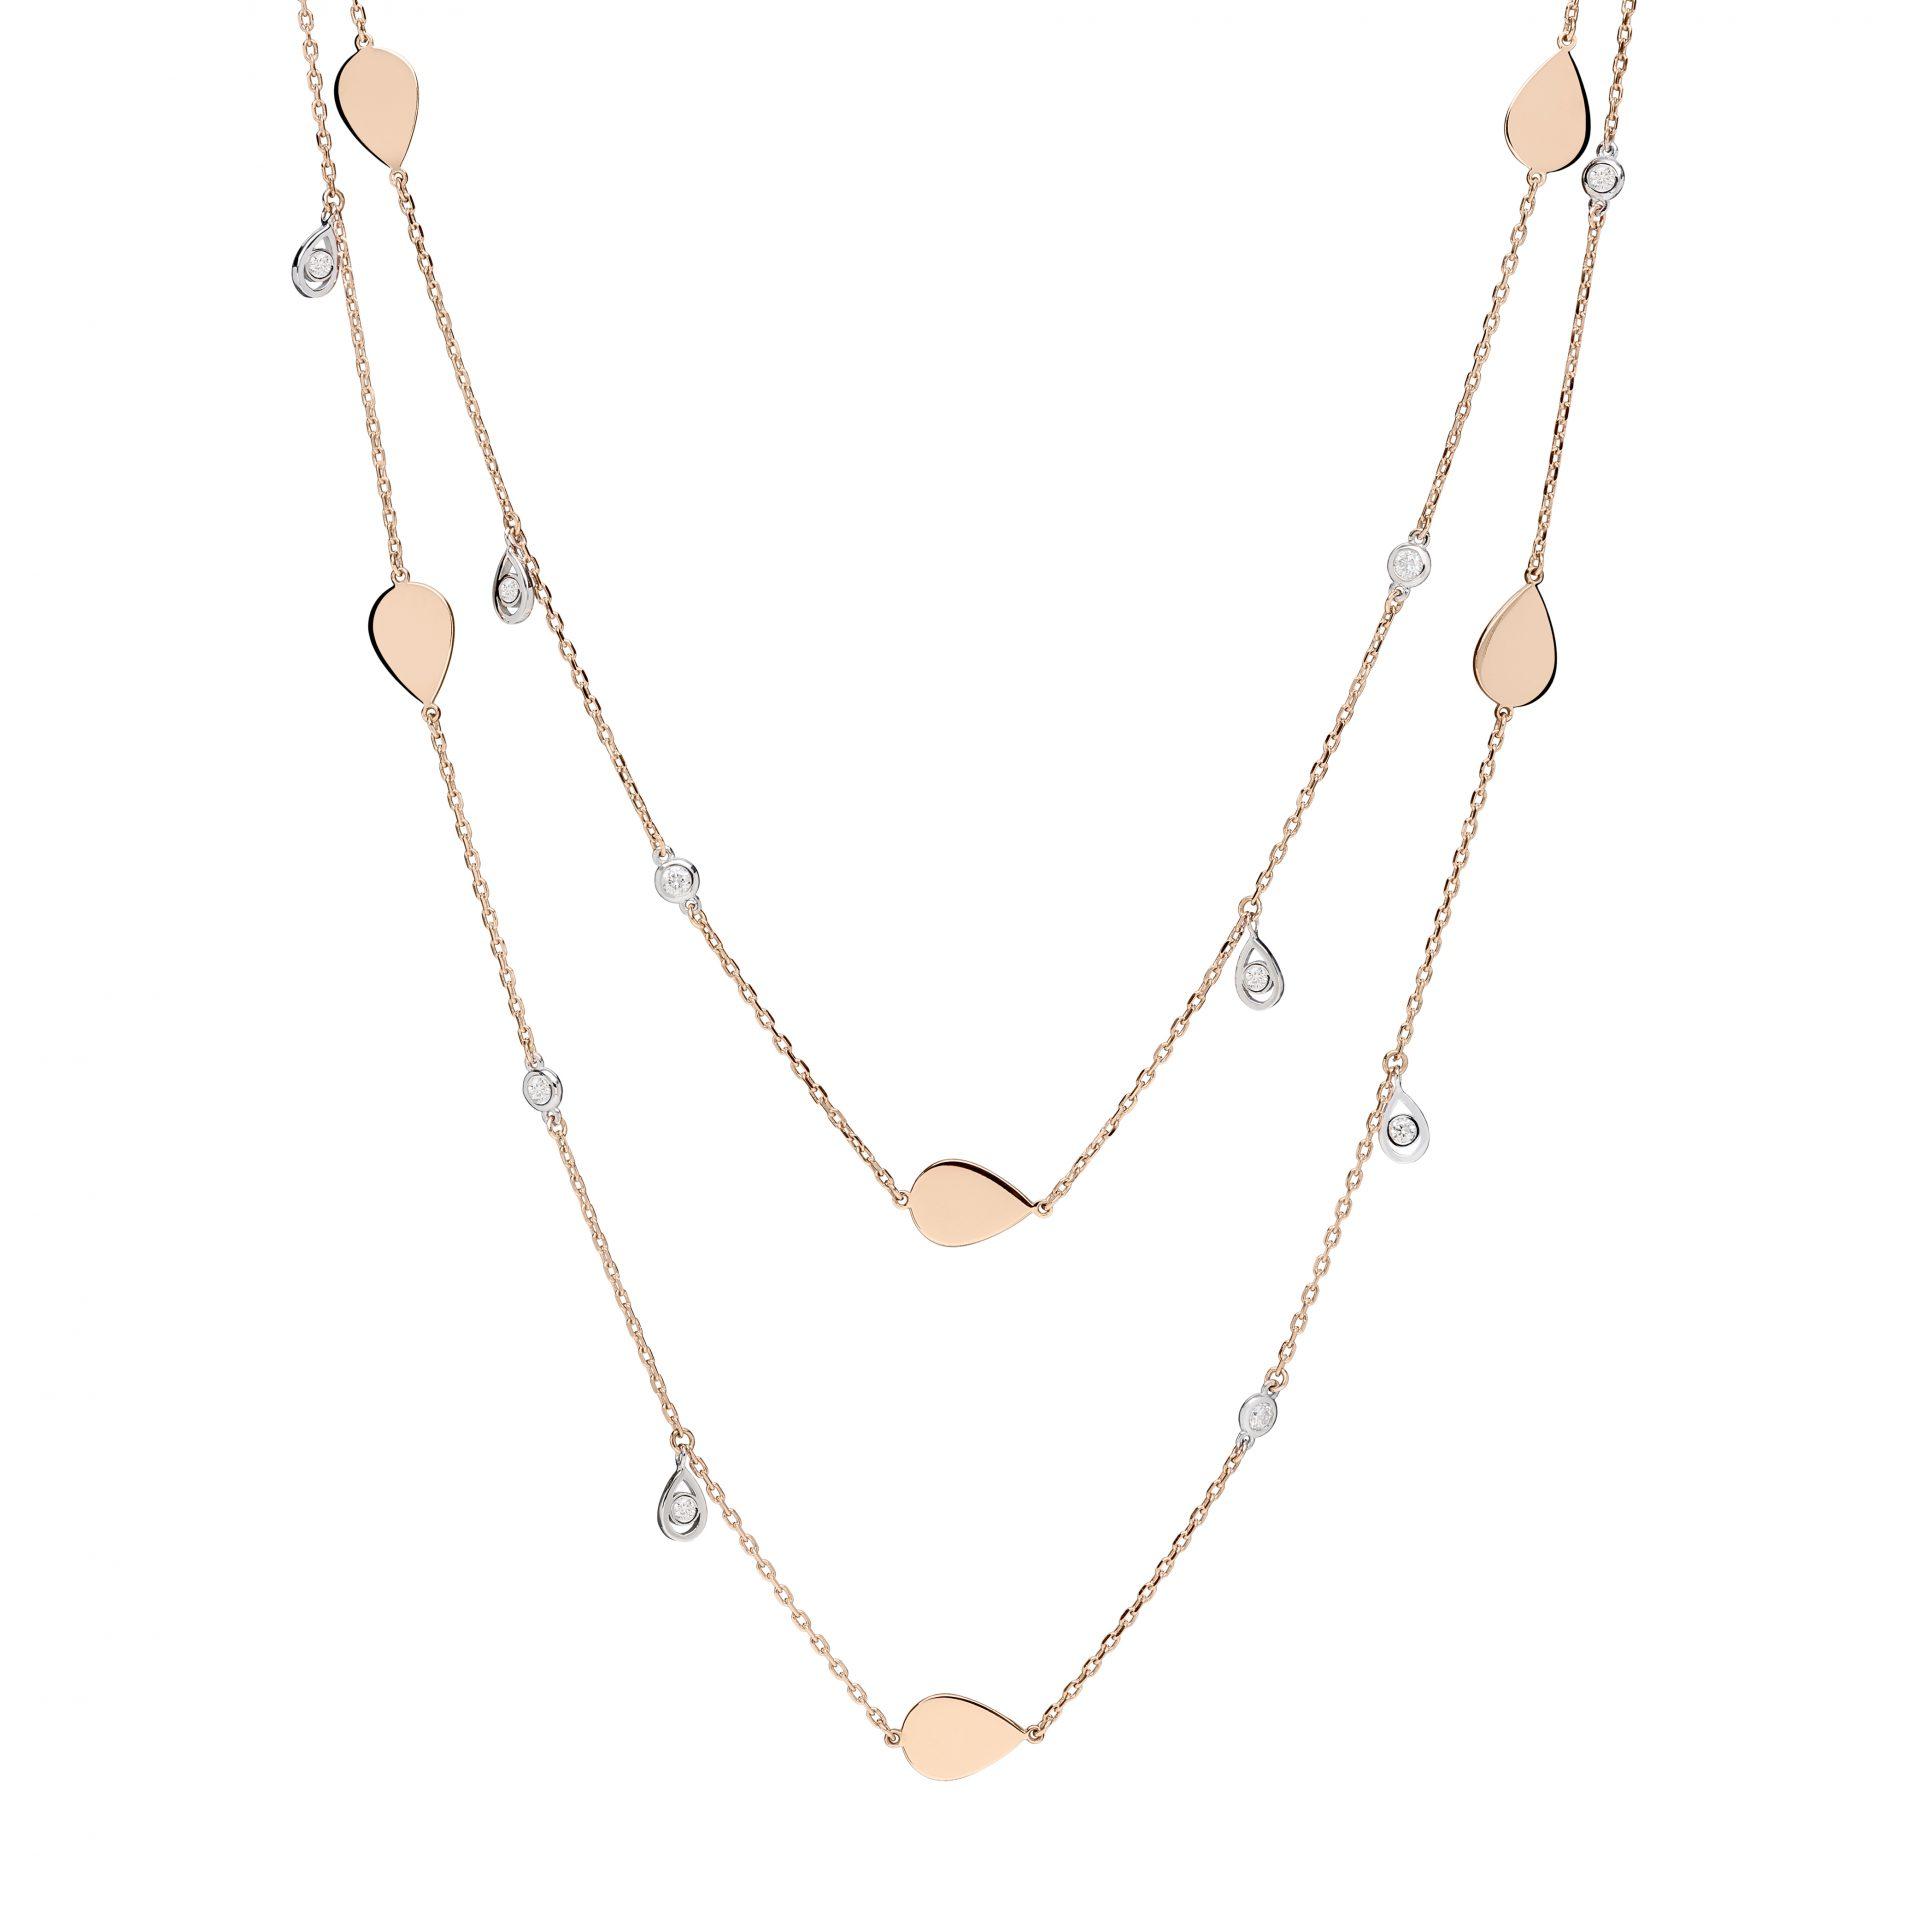 Brillanti Necklace